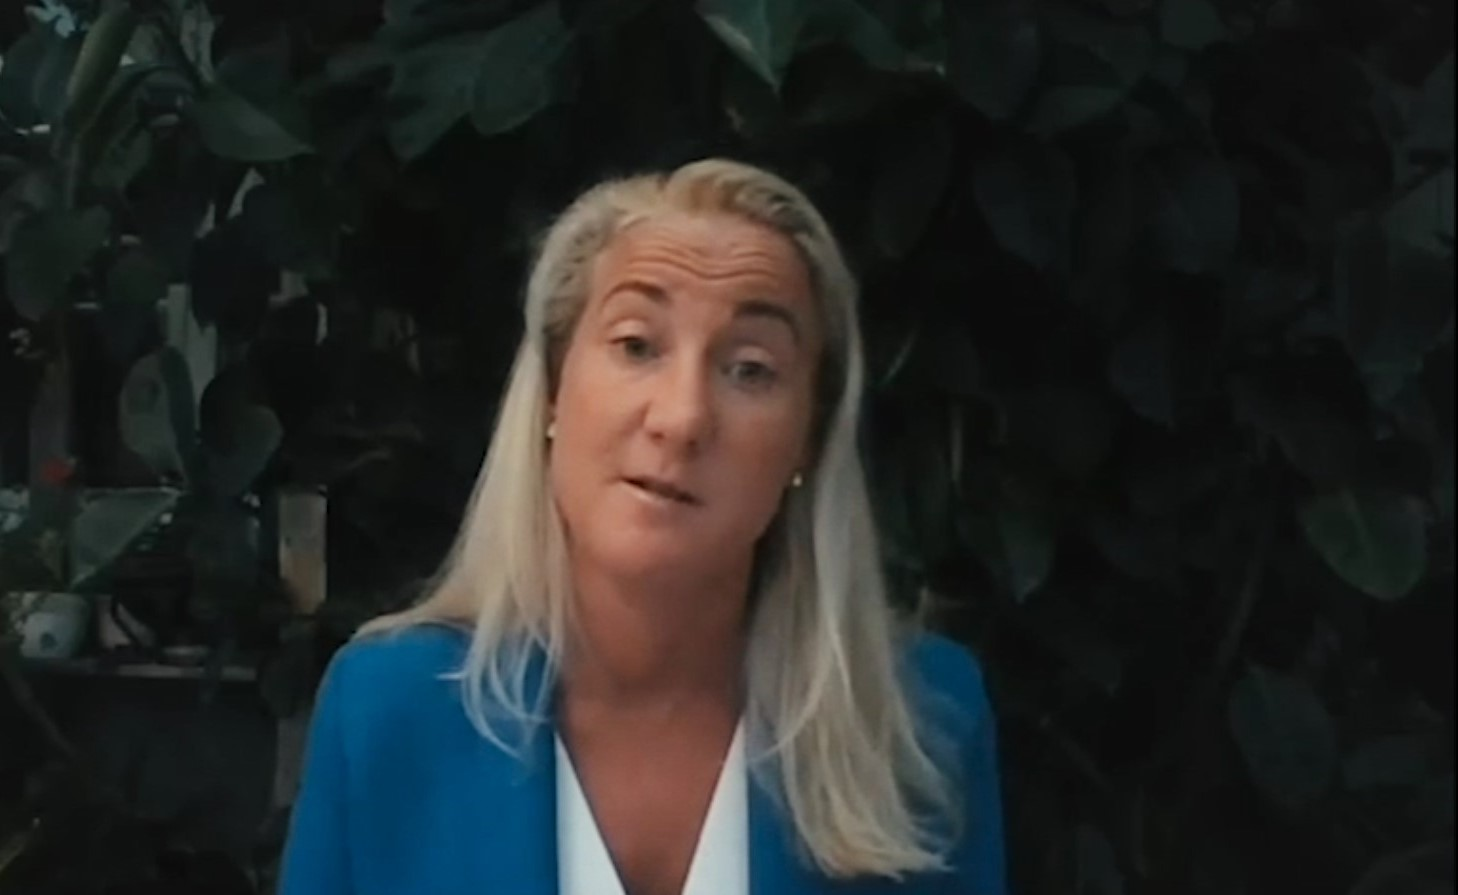 Cecila Widegren